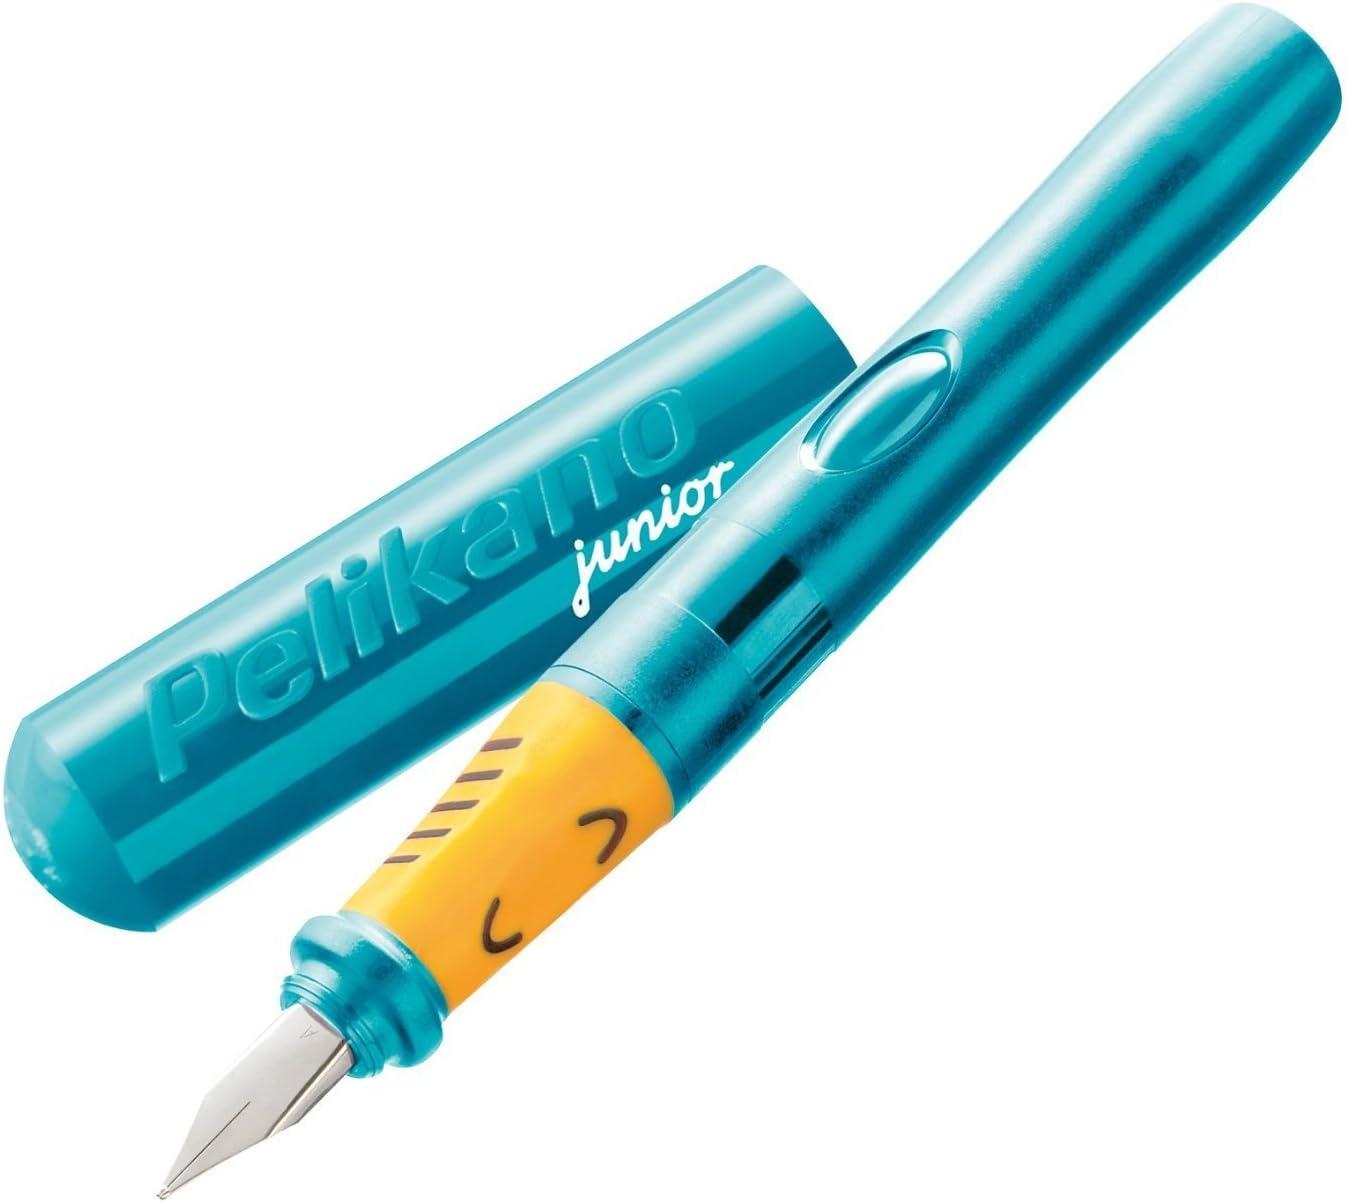 Pelikan Pelikano Jr. Fountain Pen, Left-Handed